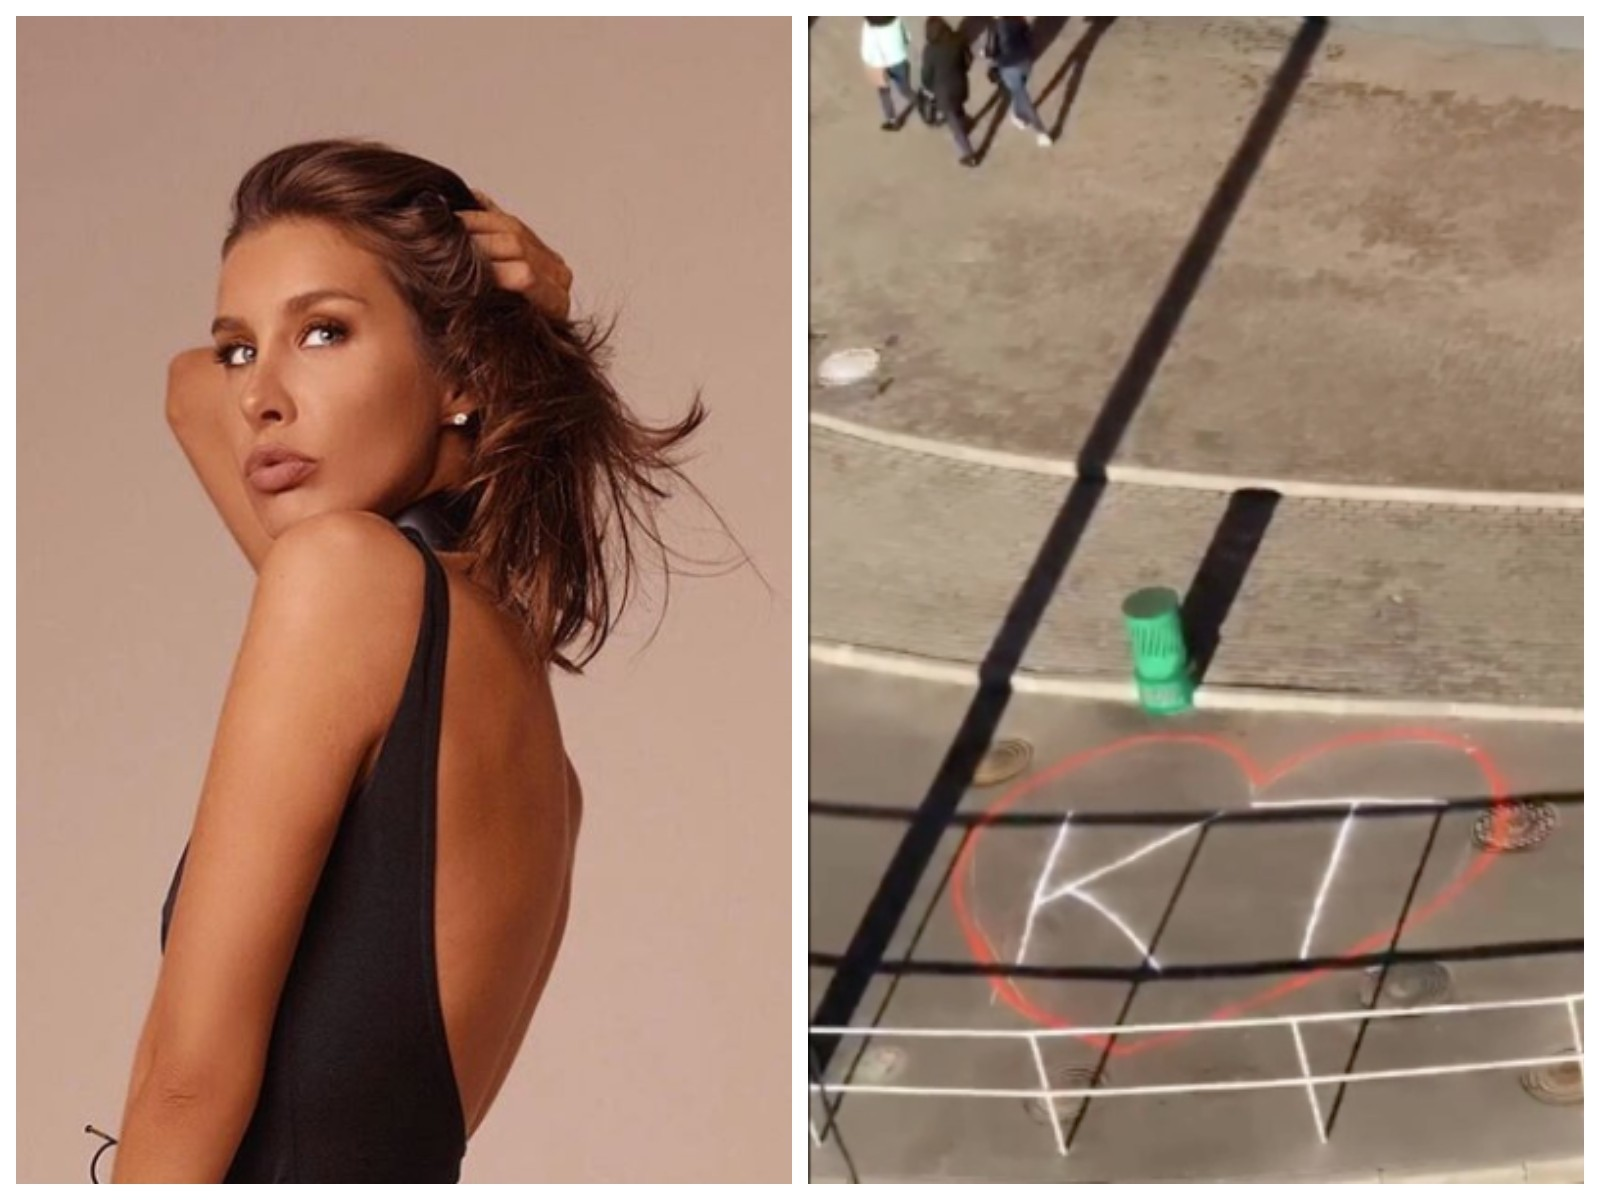 "<p>Фото © Instagram/<a href=""https://www.instagram.com/keti_one_official/"" target=""_self""><strong>keti_one_official</strong></a></p>"